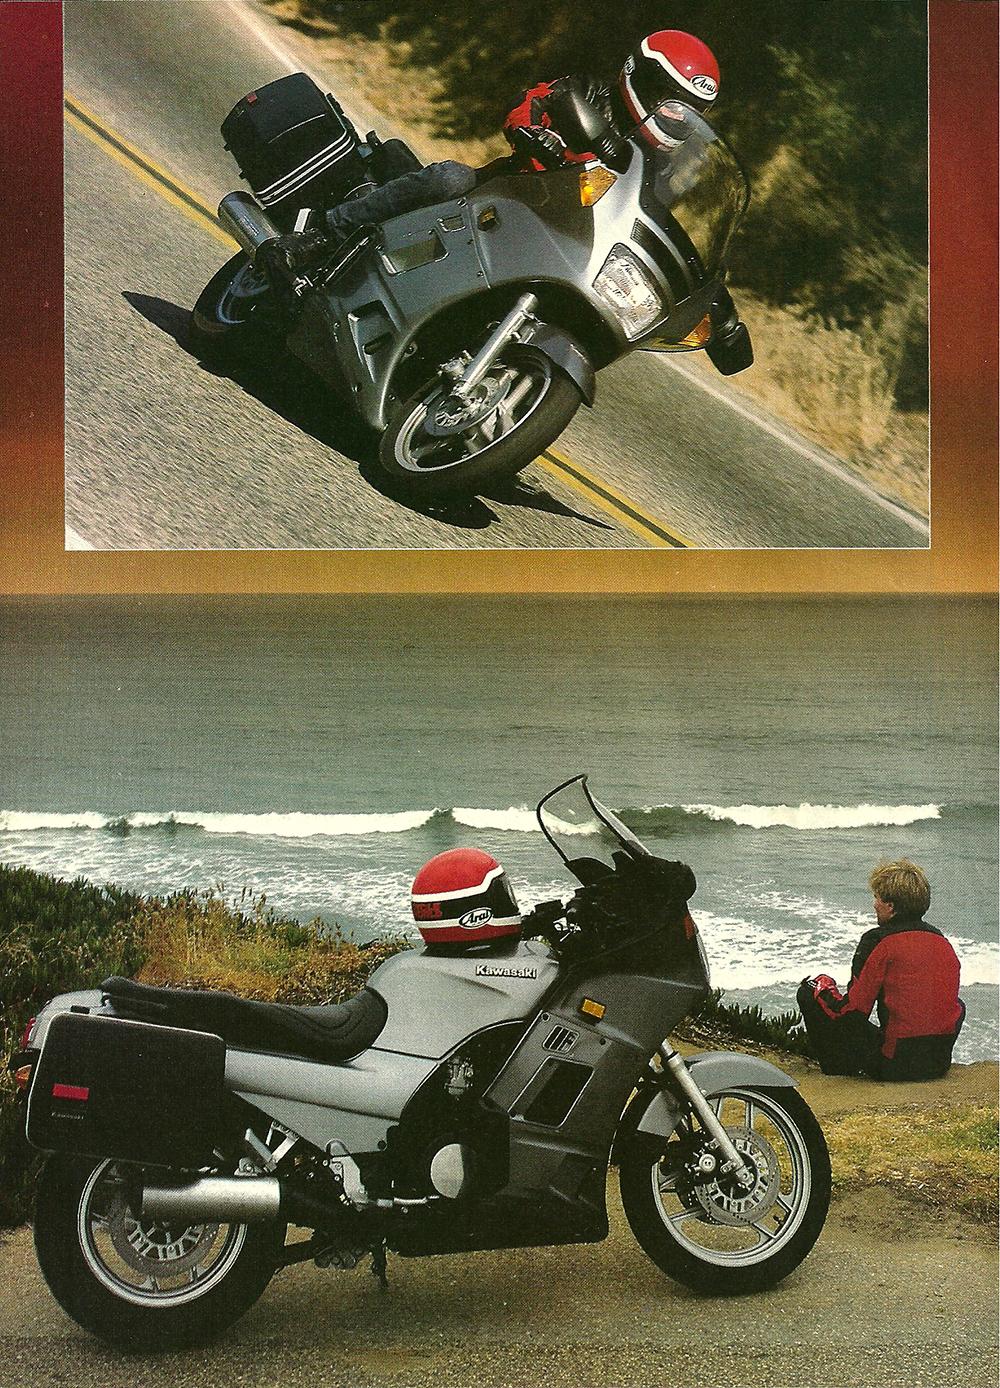 1986 Kawasaki 1000 Concours road test 01.jpg